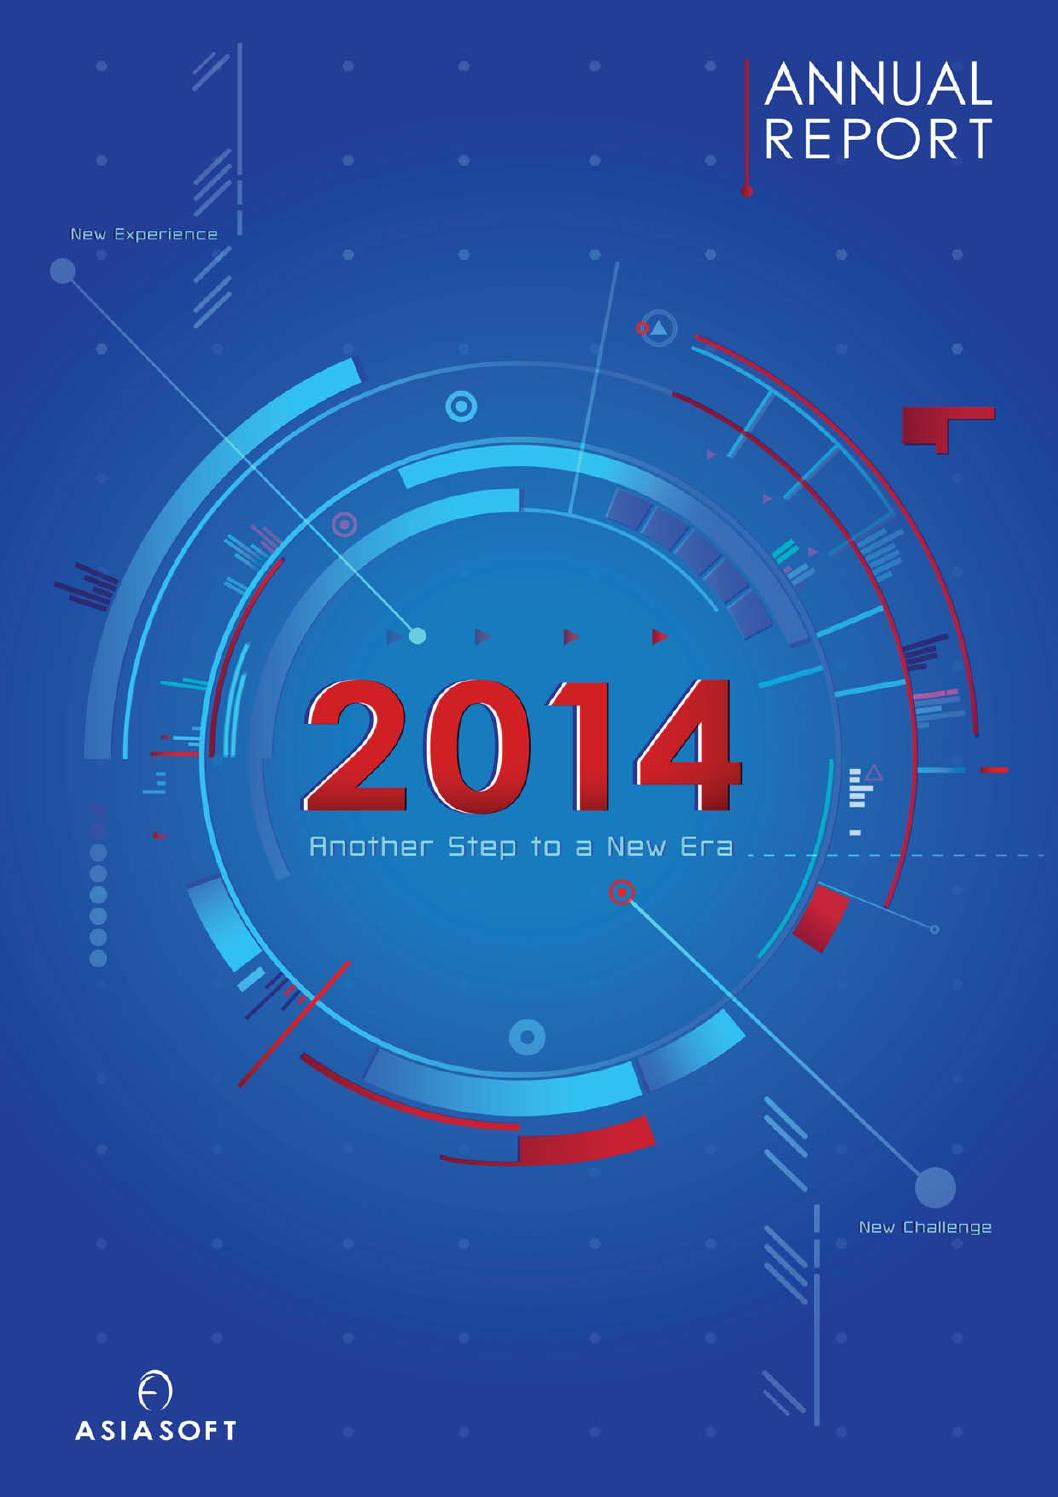 Annual Report 2014 by shareinvestor shareinvestor - issuu